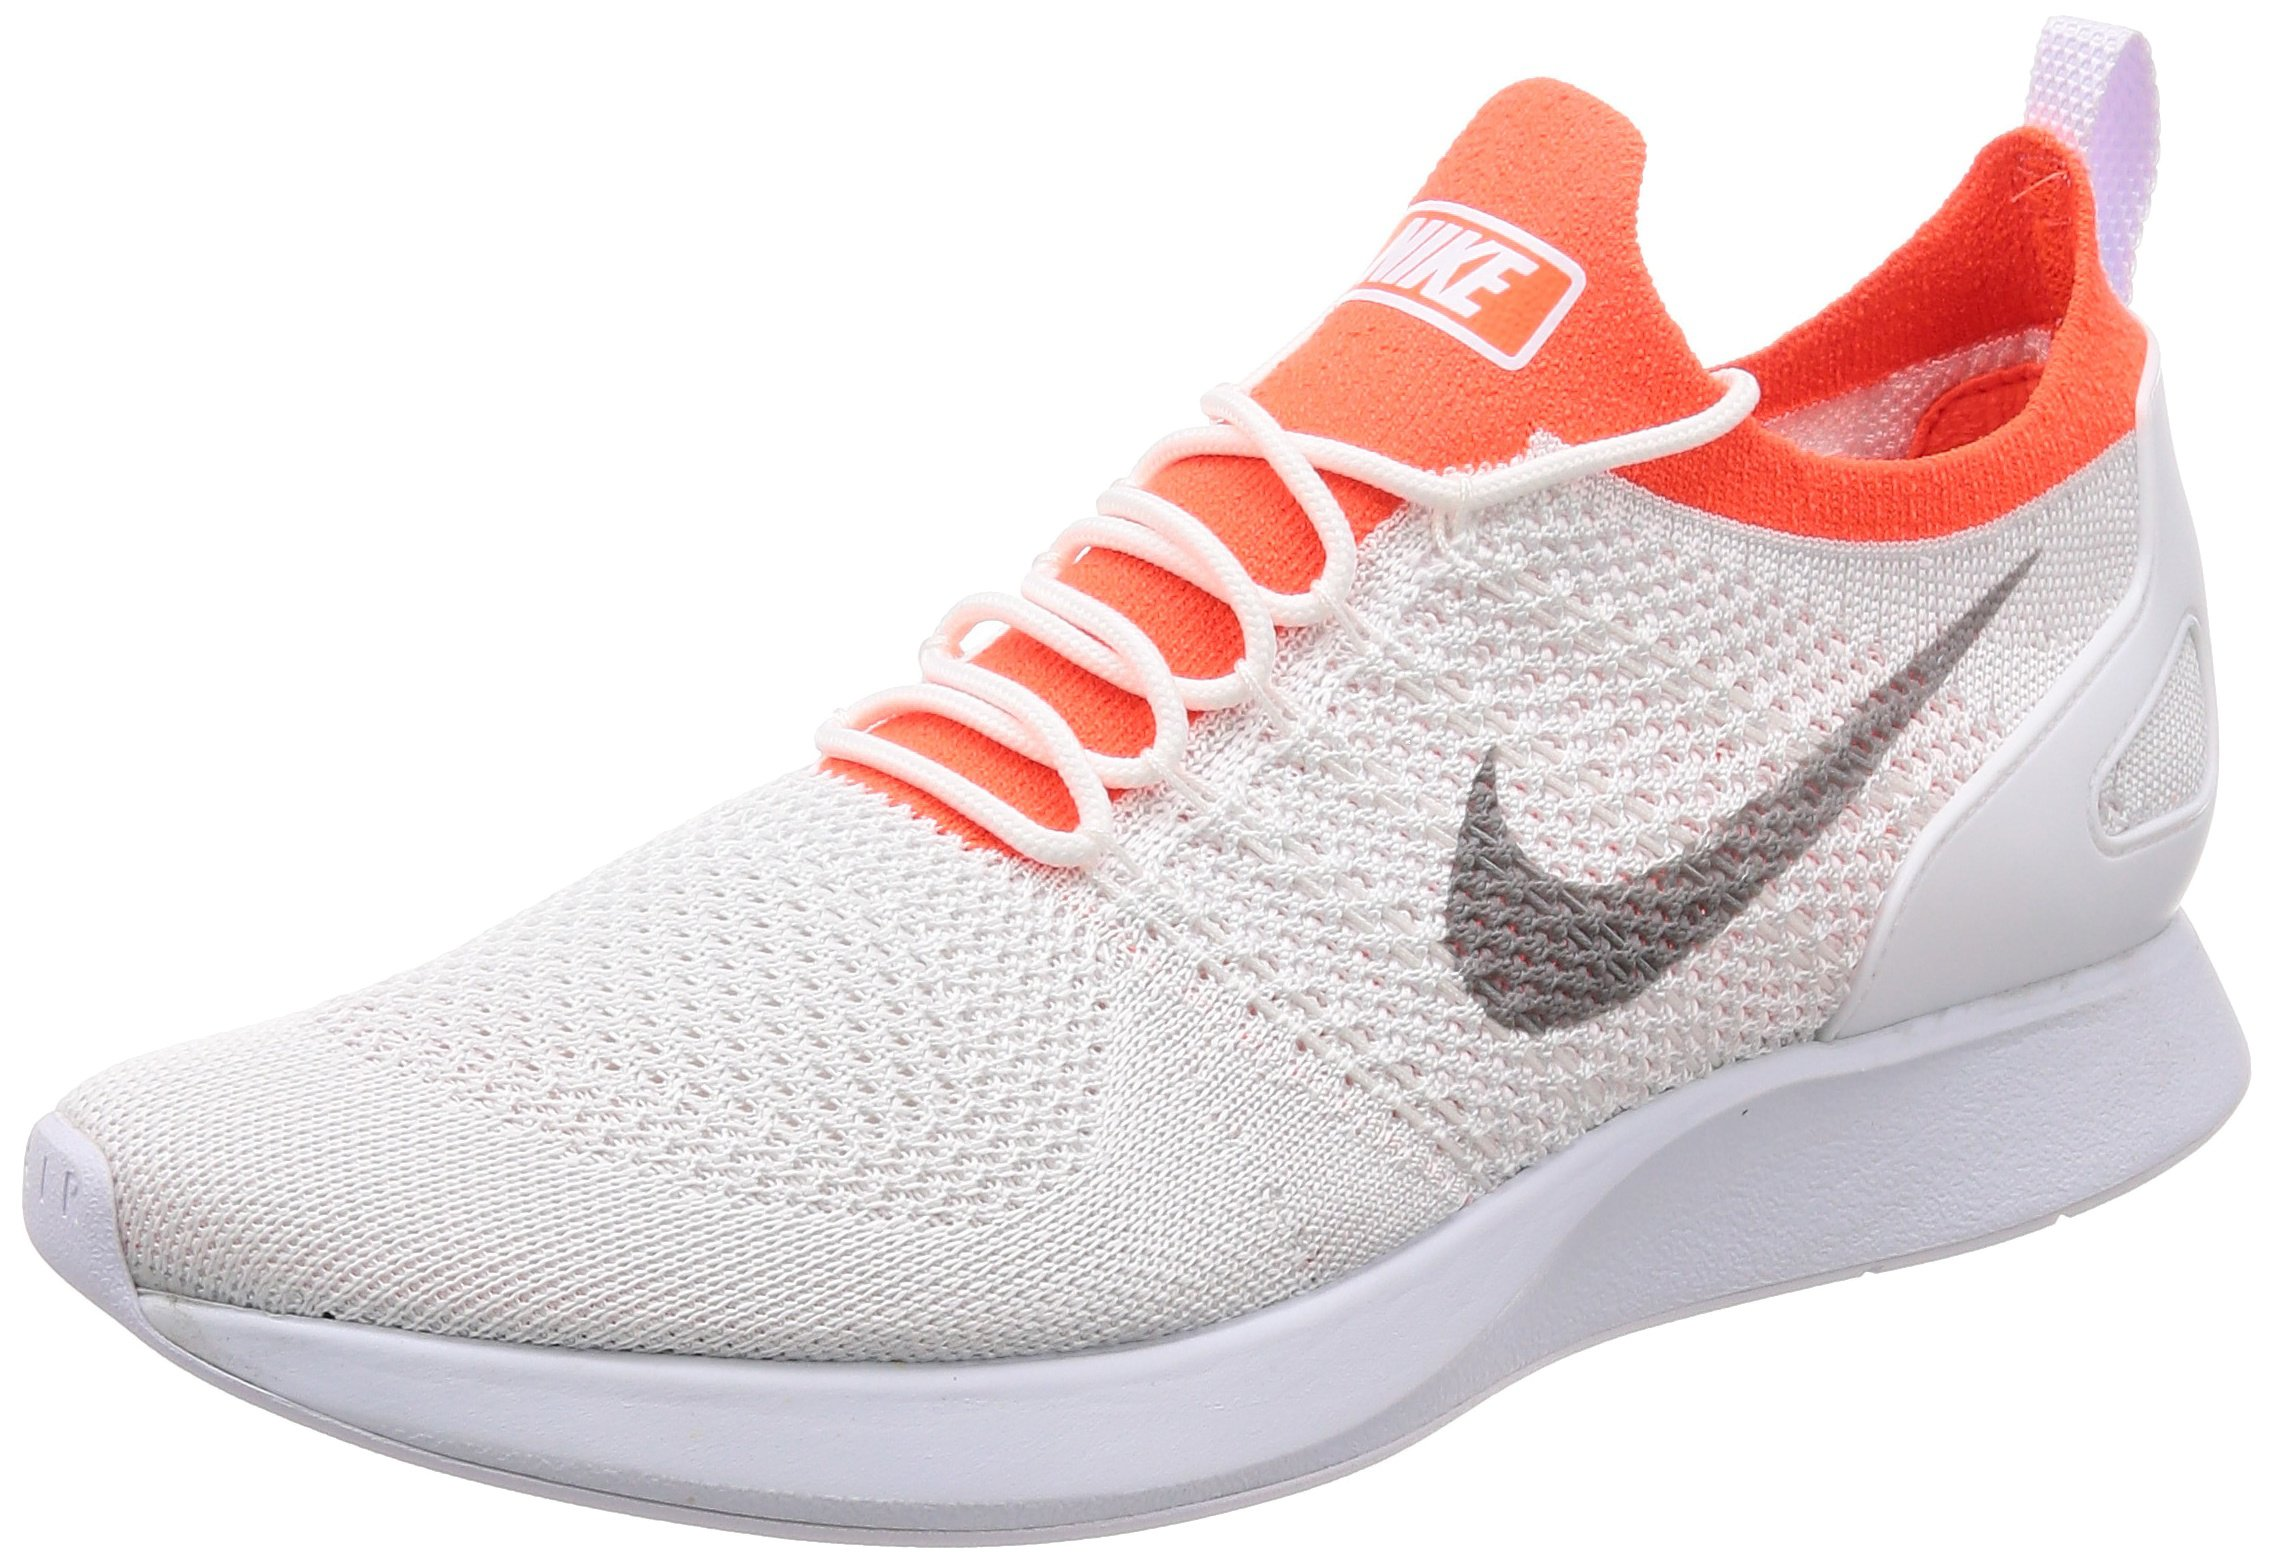 360a6a2852d1 Galleon - Nike Men s Air Zoom Mariah Flyknit Racer